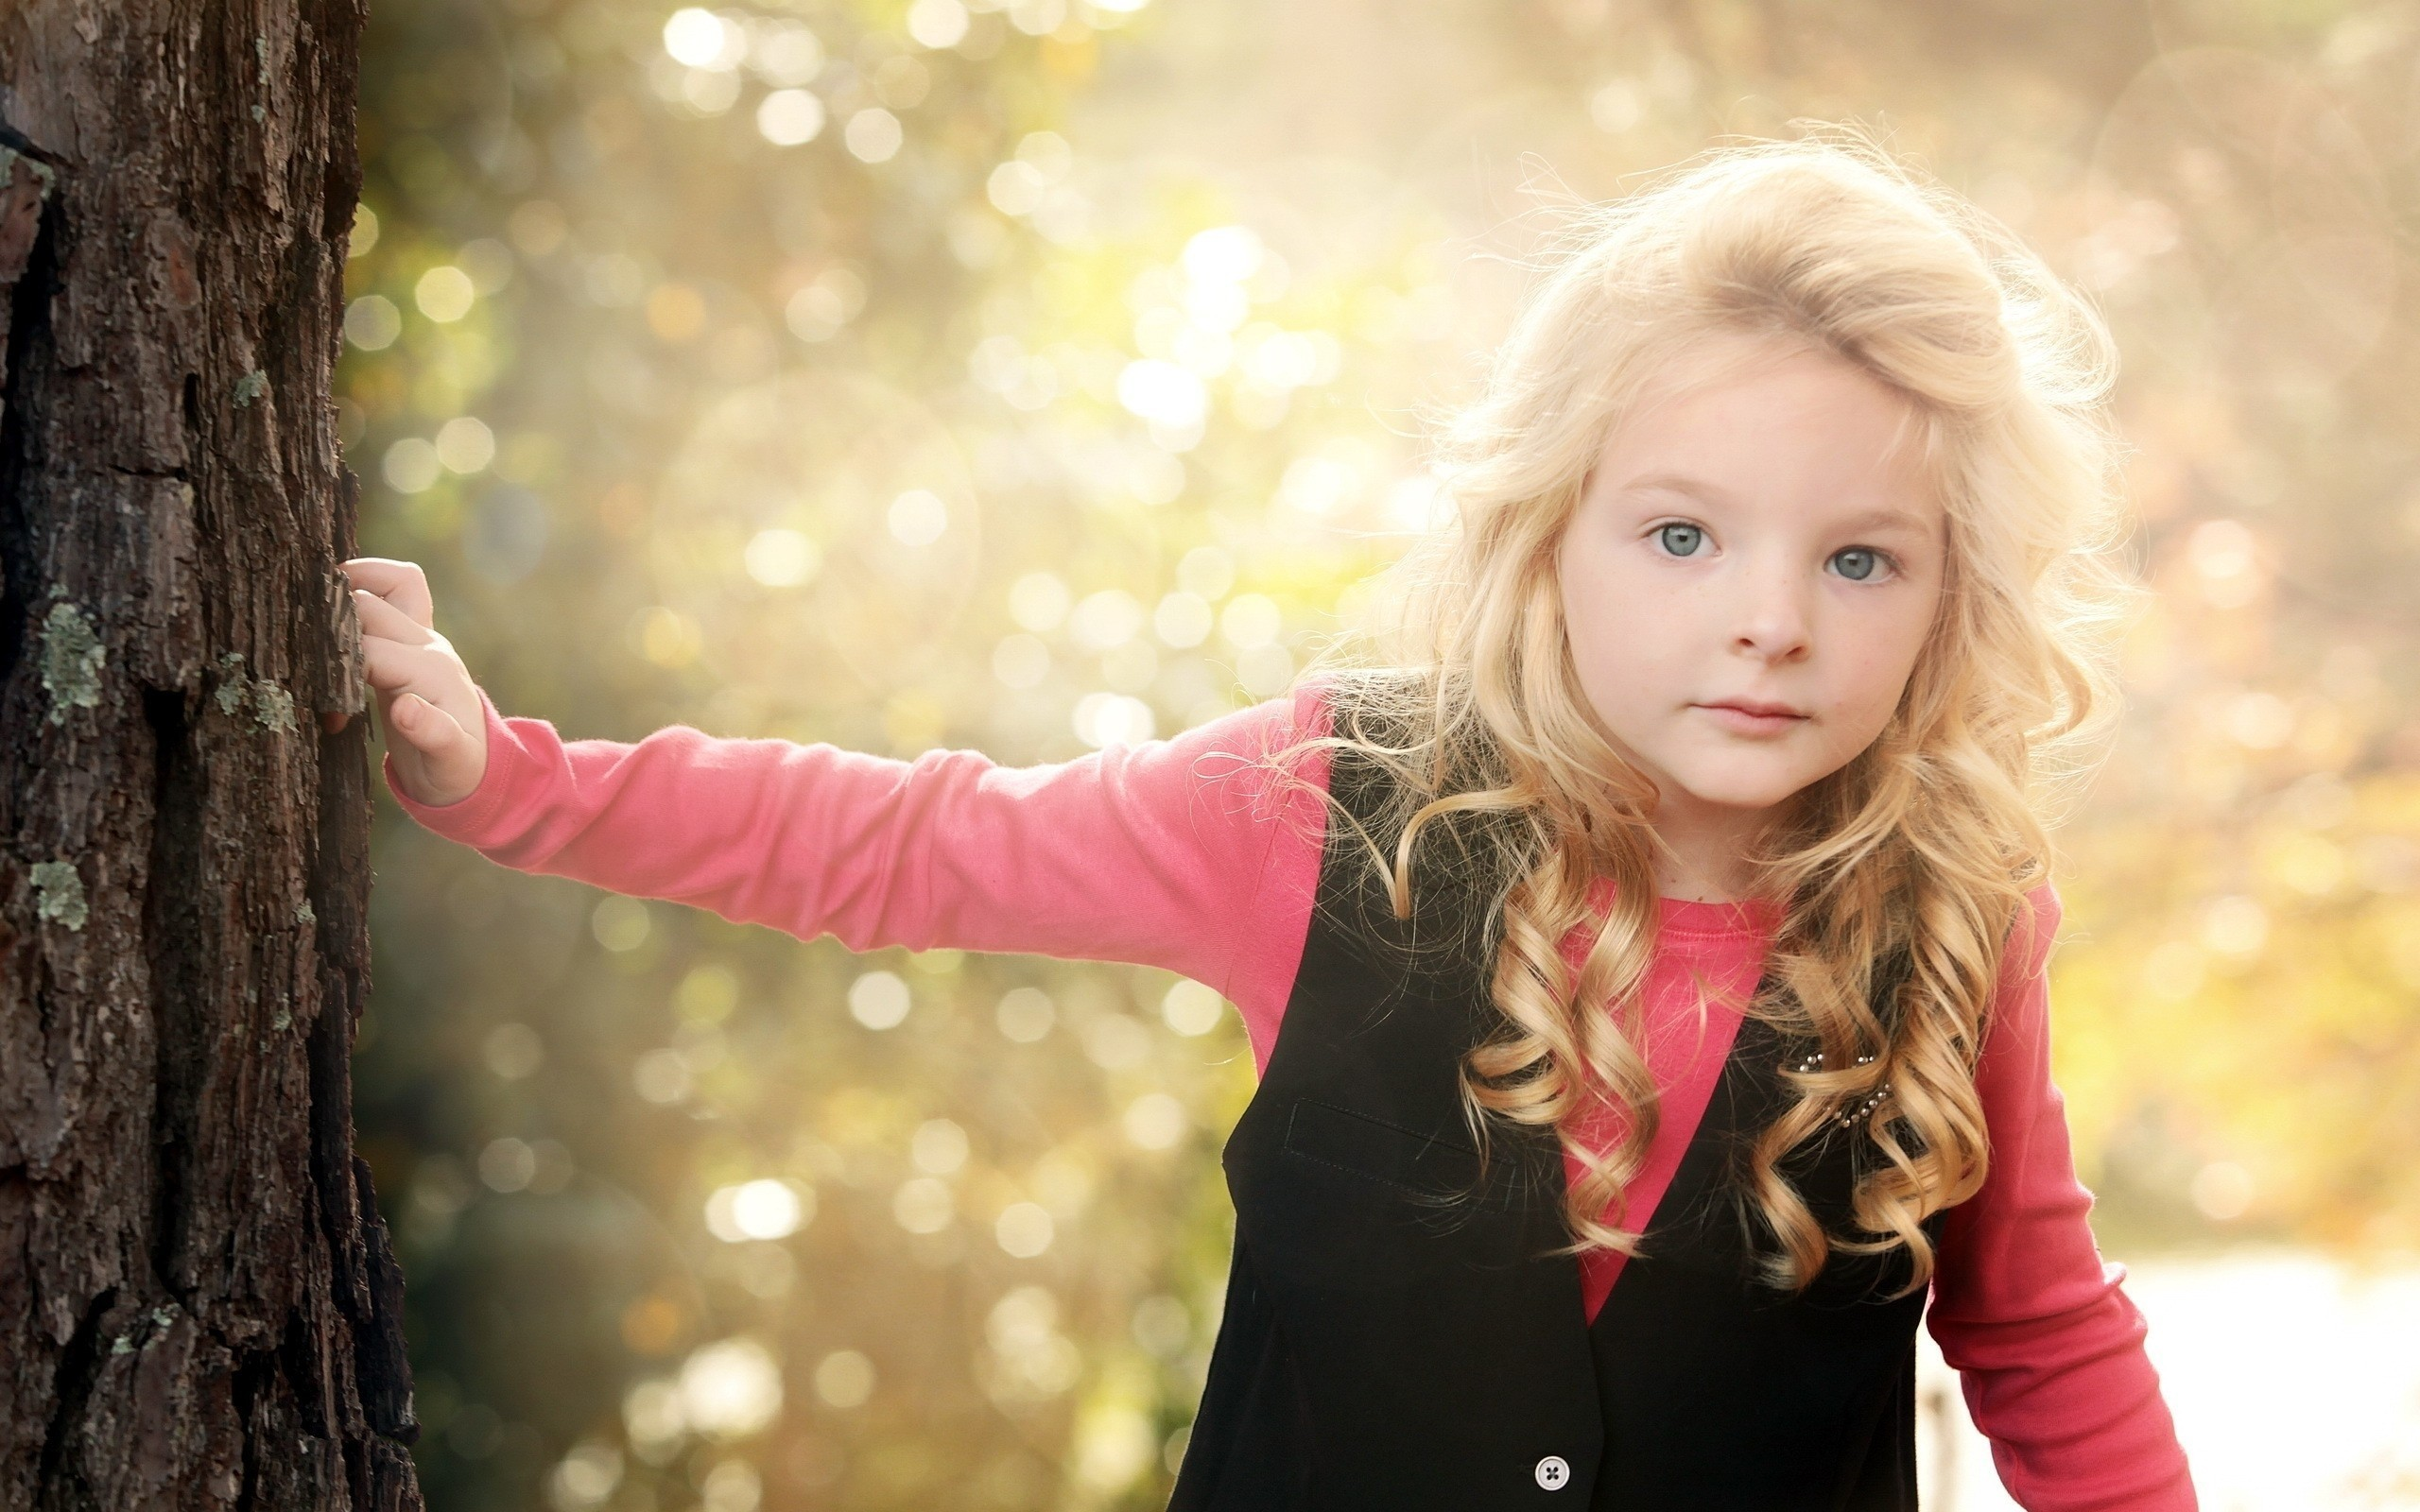 Hd - Cute little girl pic hd ...